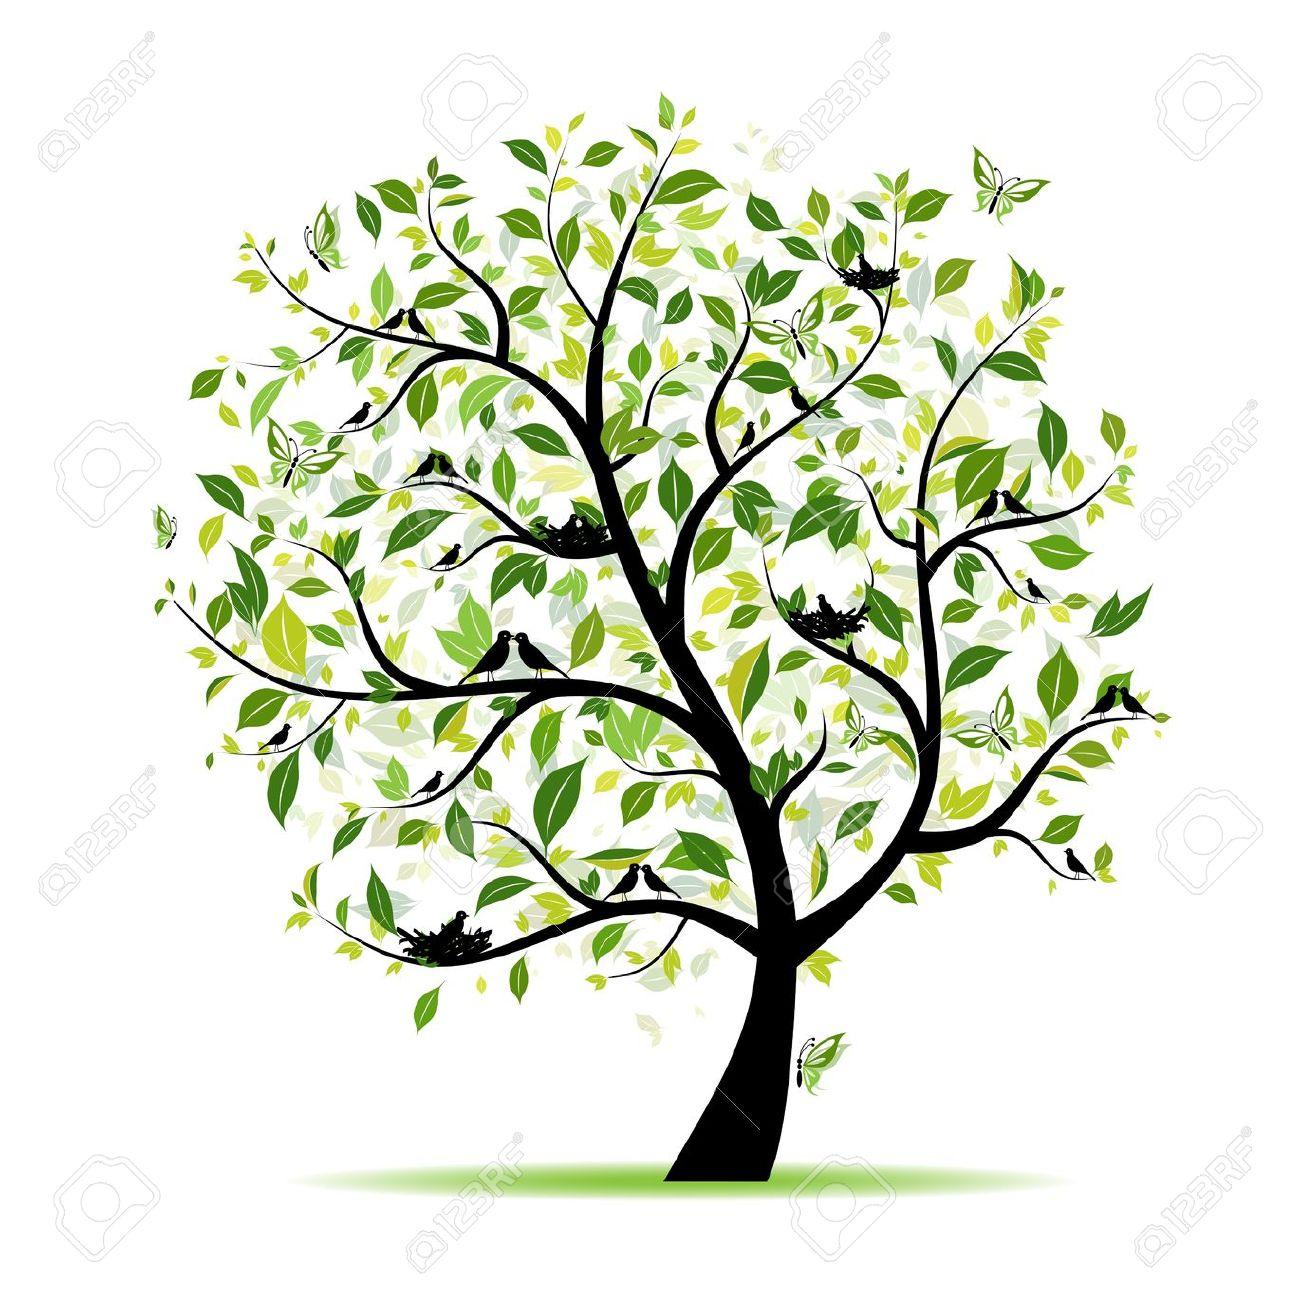 Spring Tree Clipart Transparent.